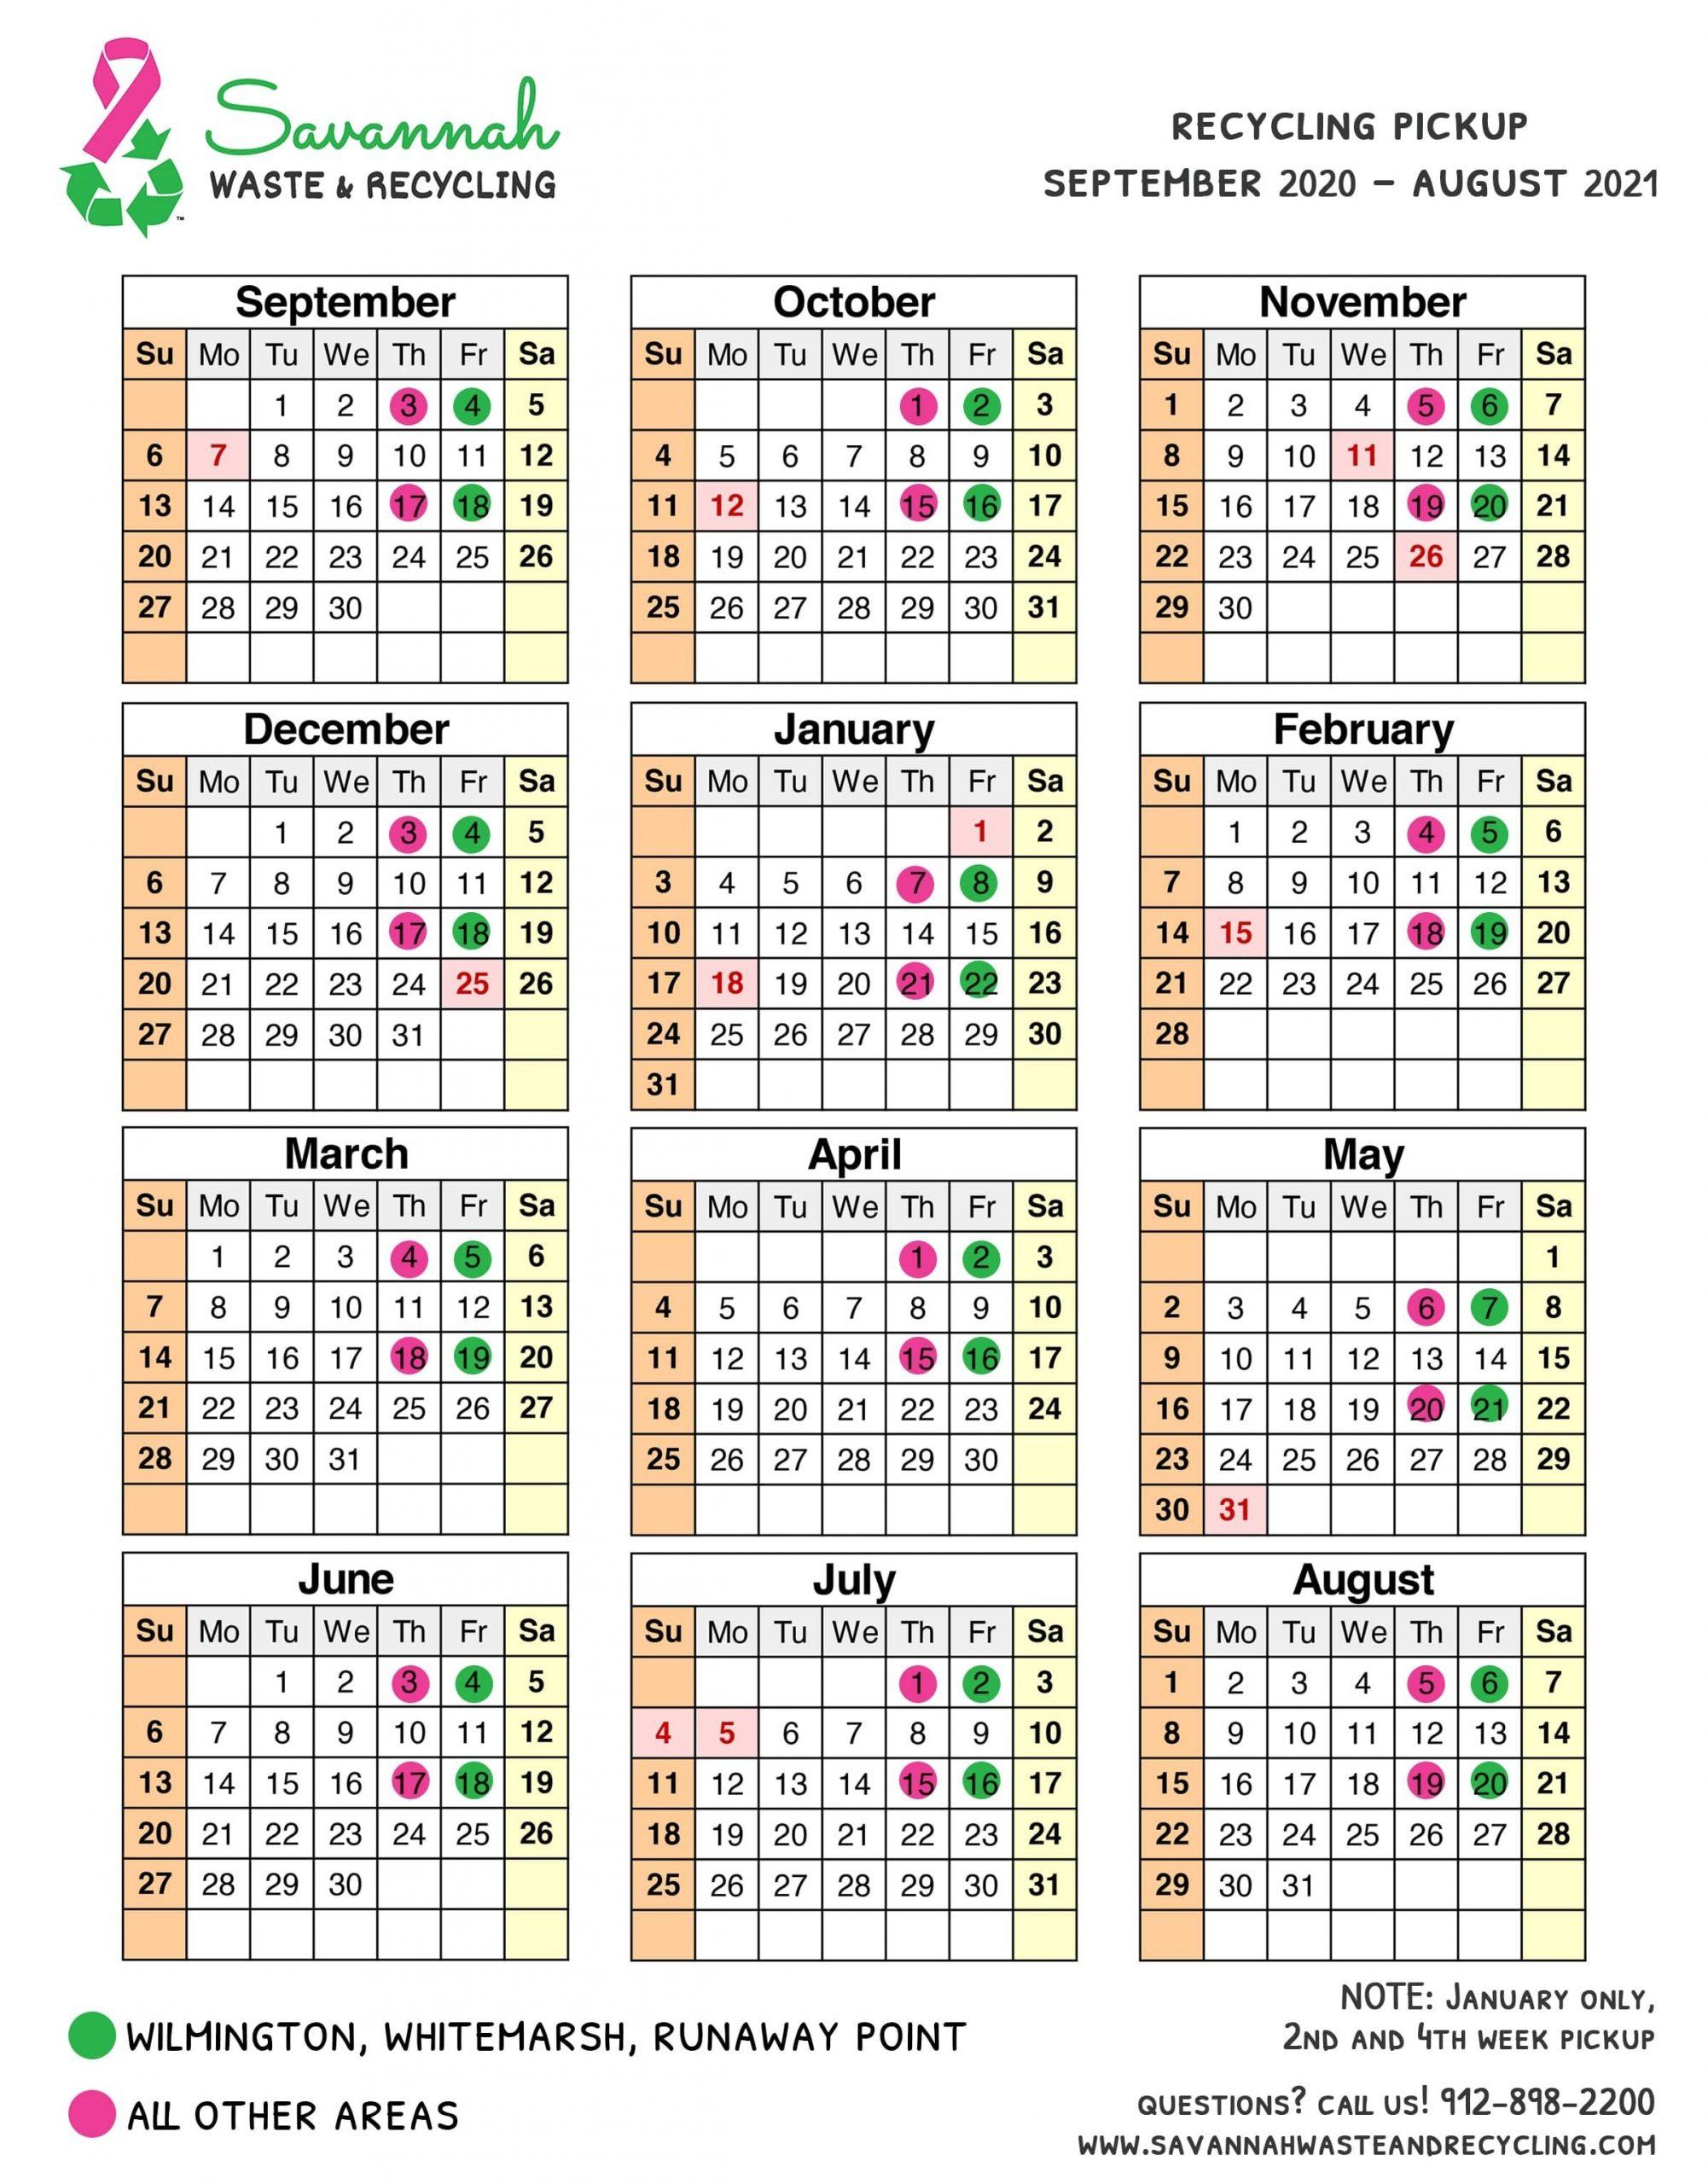 Recycling Calendar | Savannah Waste & Recycling